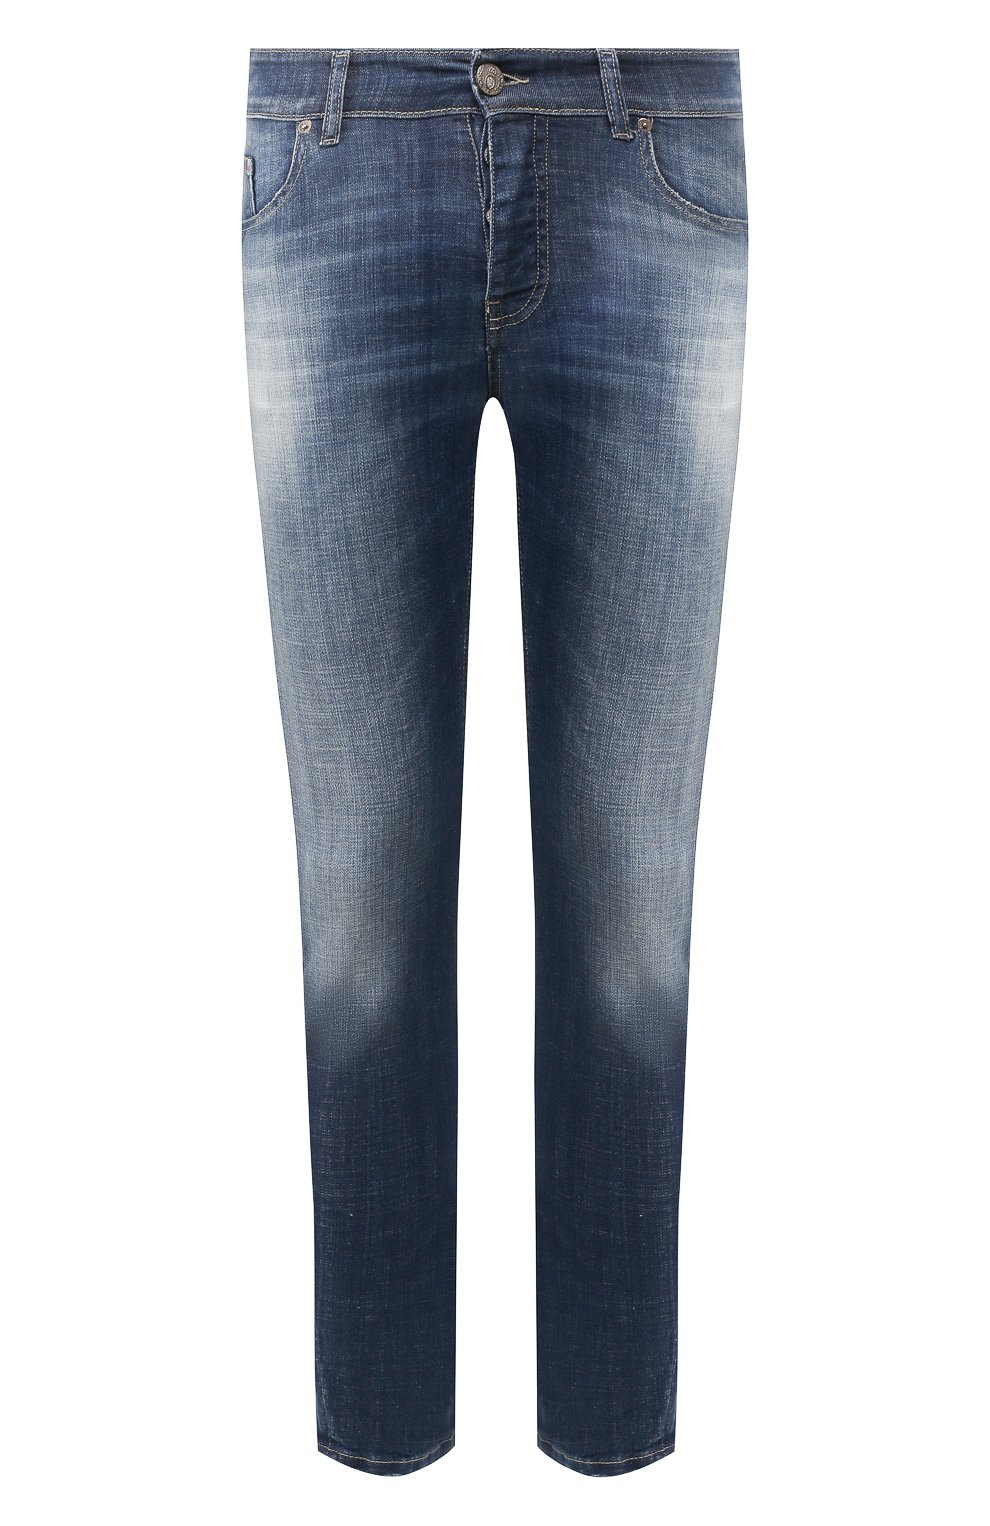 Мужские джинсы PREMIUM MOOD DENIM SUPERIOR синего цвета, арт. S20 0352740020E/BARRET | Фото 1